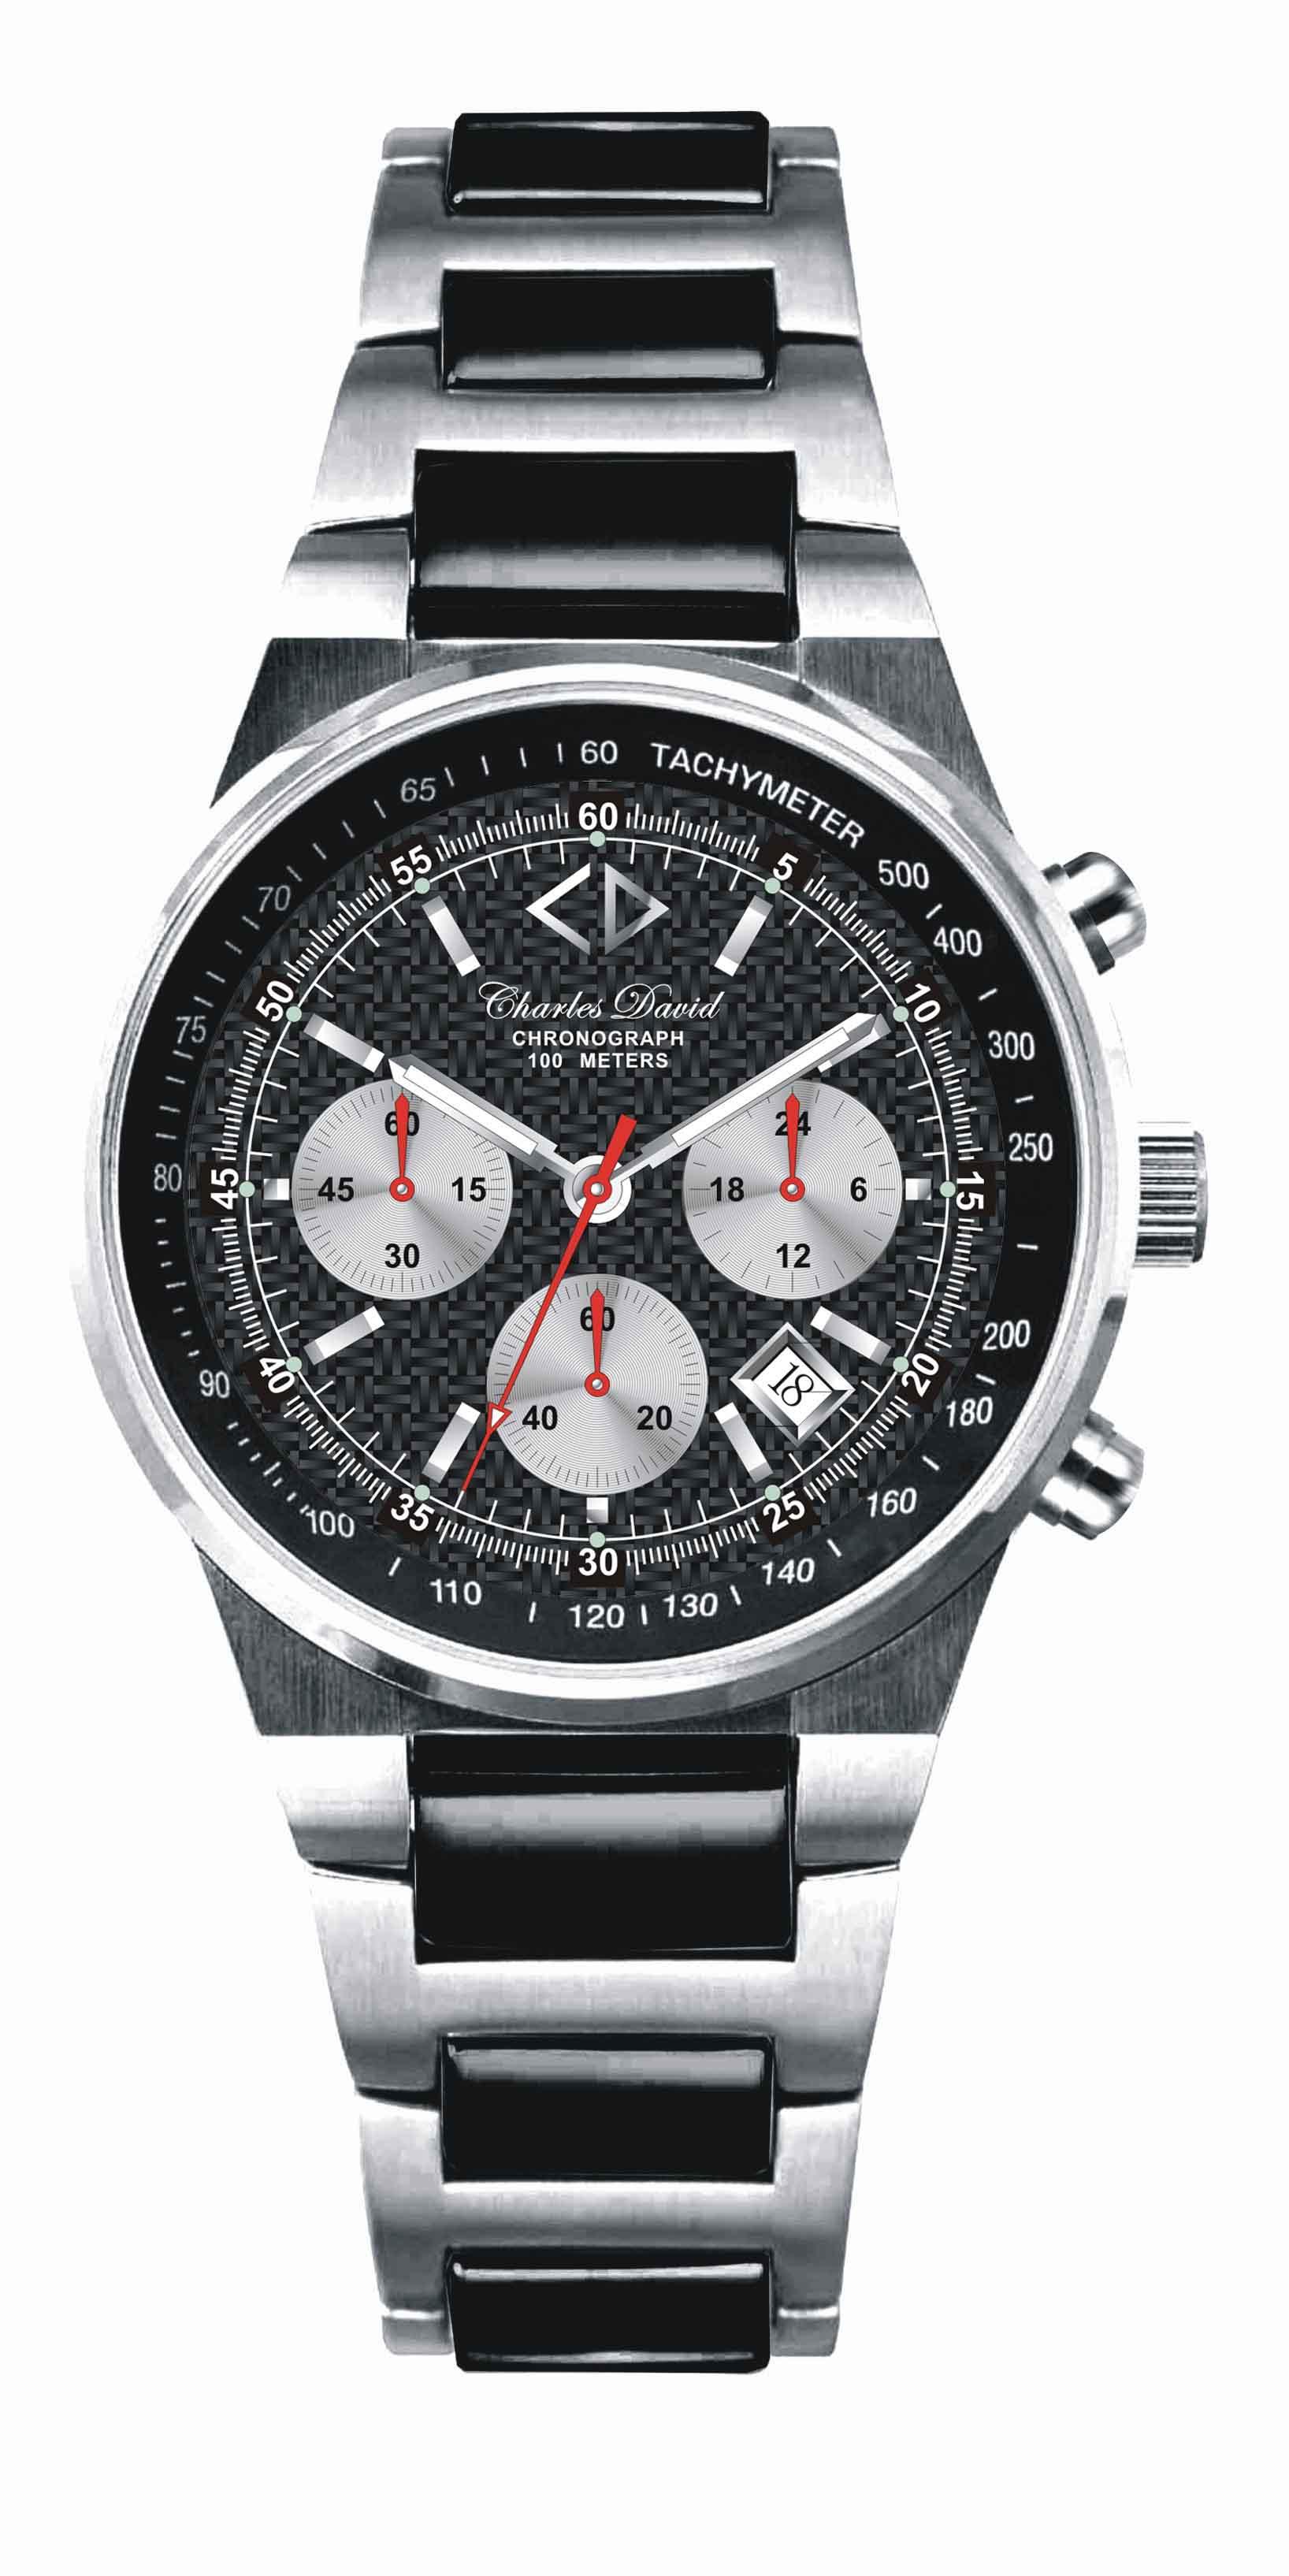 Magma Chronograph Carbon Fiber Dial Watch